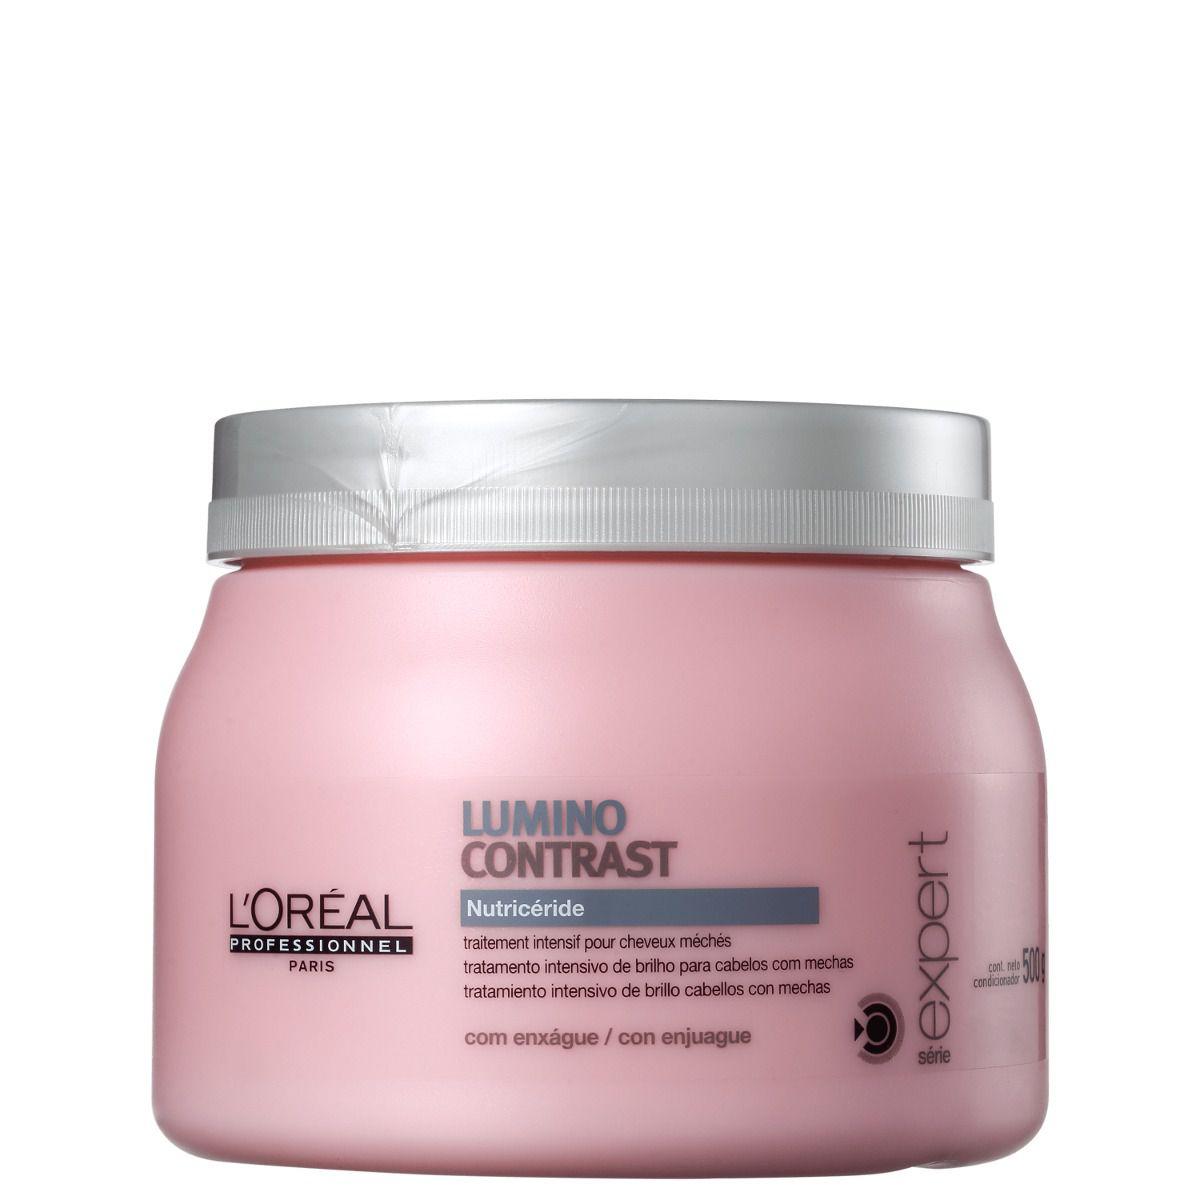 L'Oréal Professionnel Máscara Expert Lumino Contrast 500g